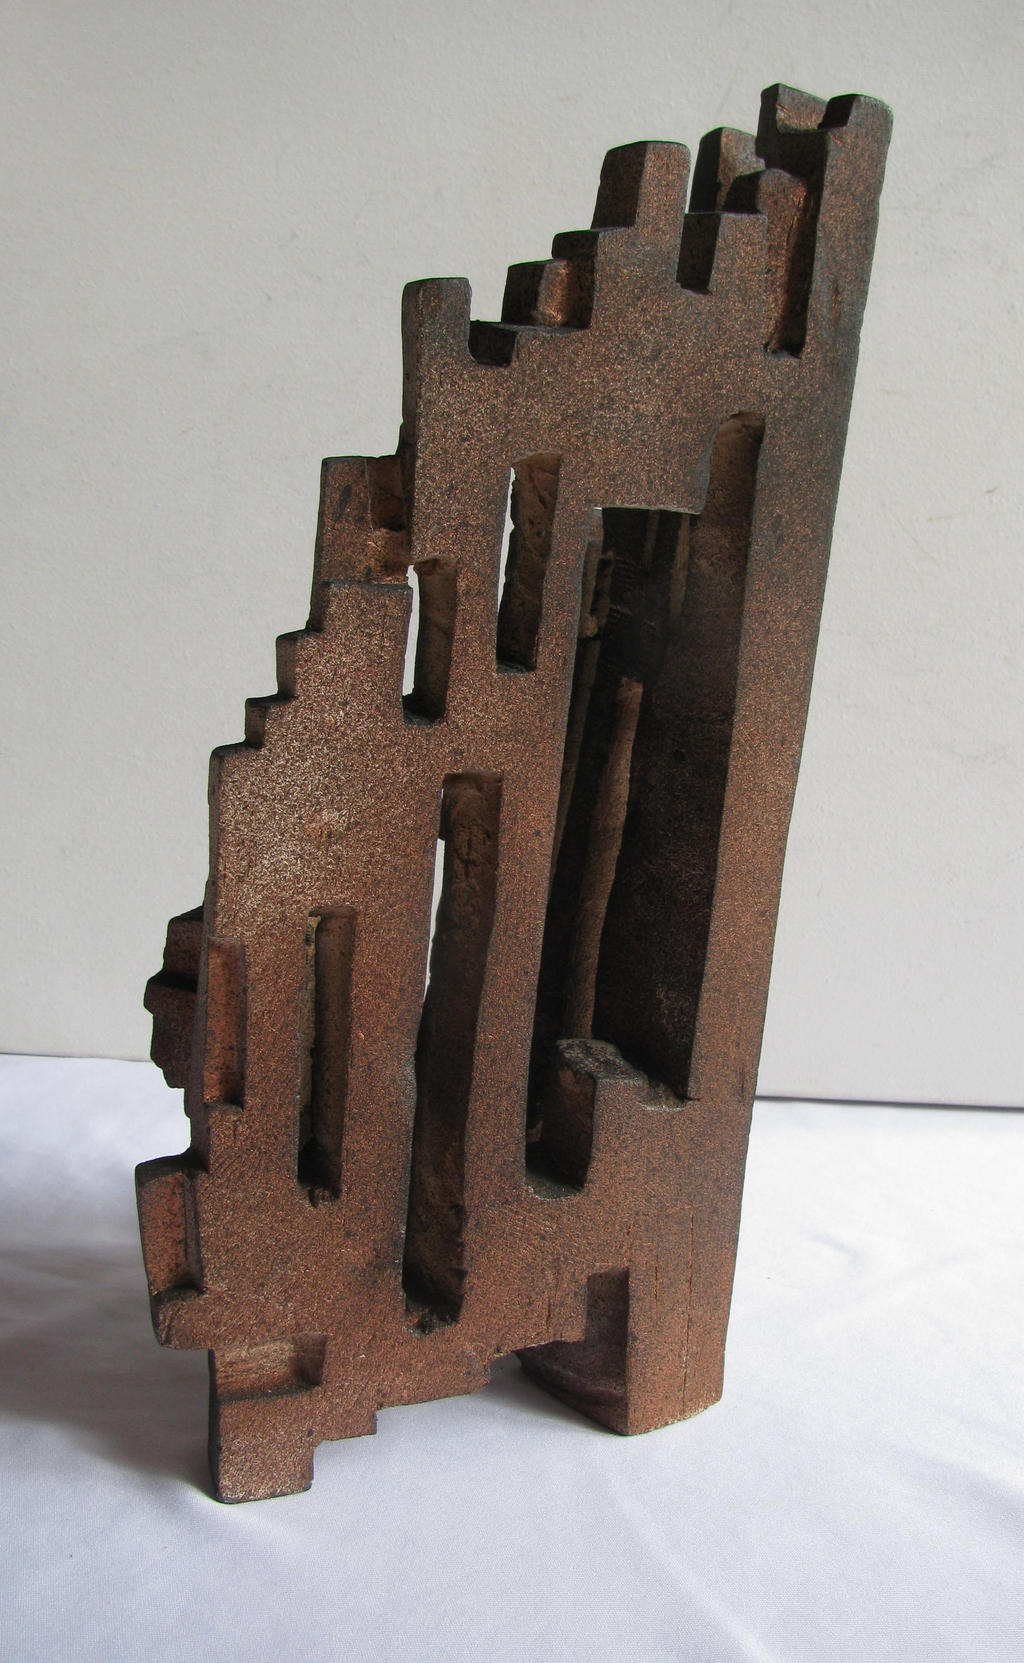 Ceramic small sculptures by Radan22